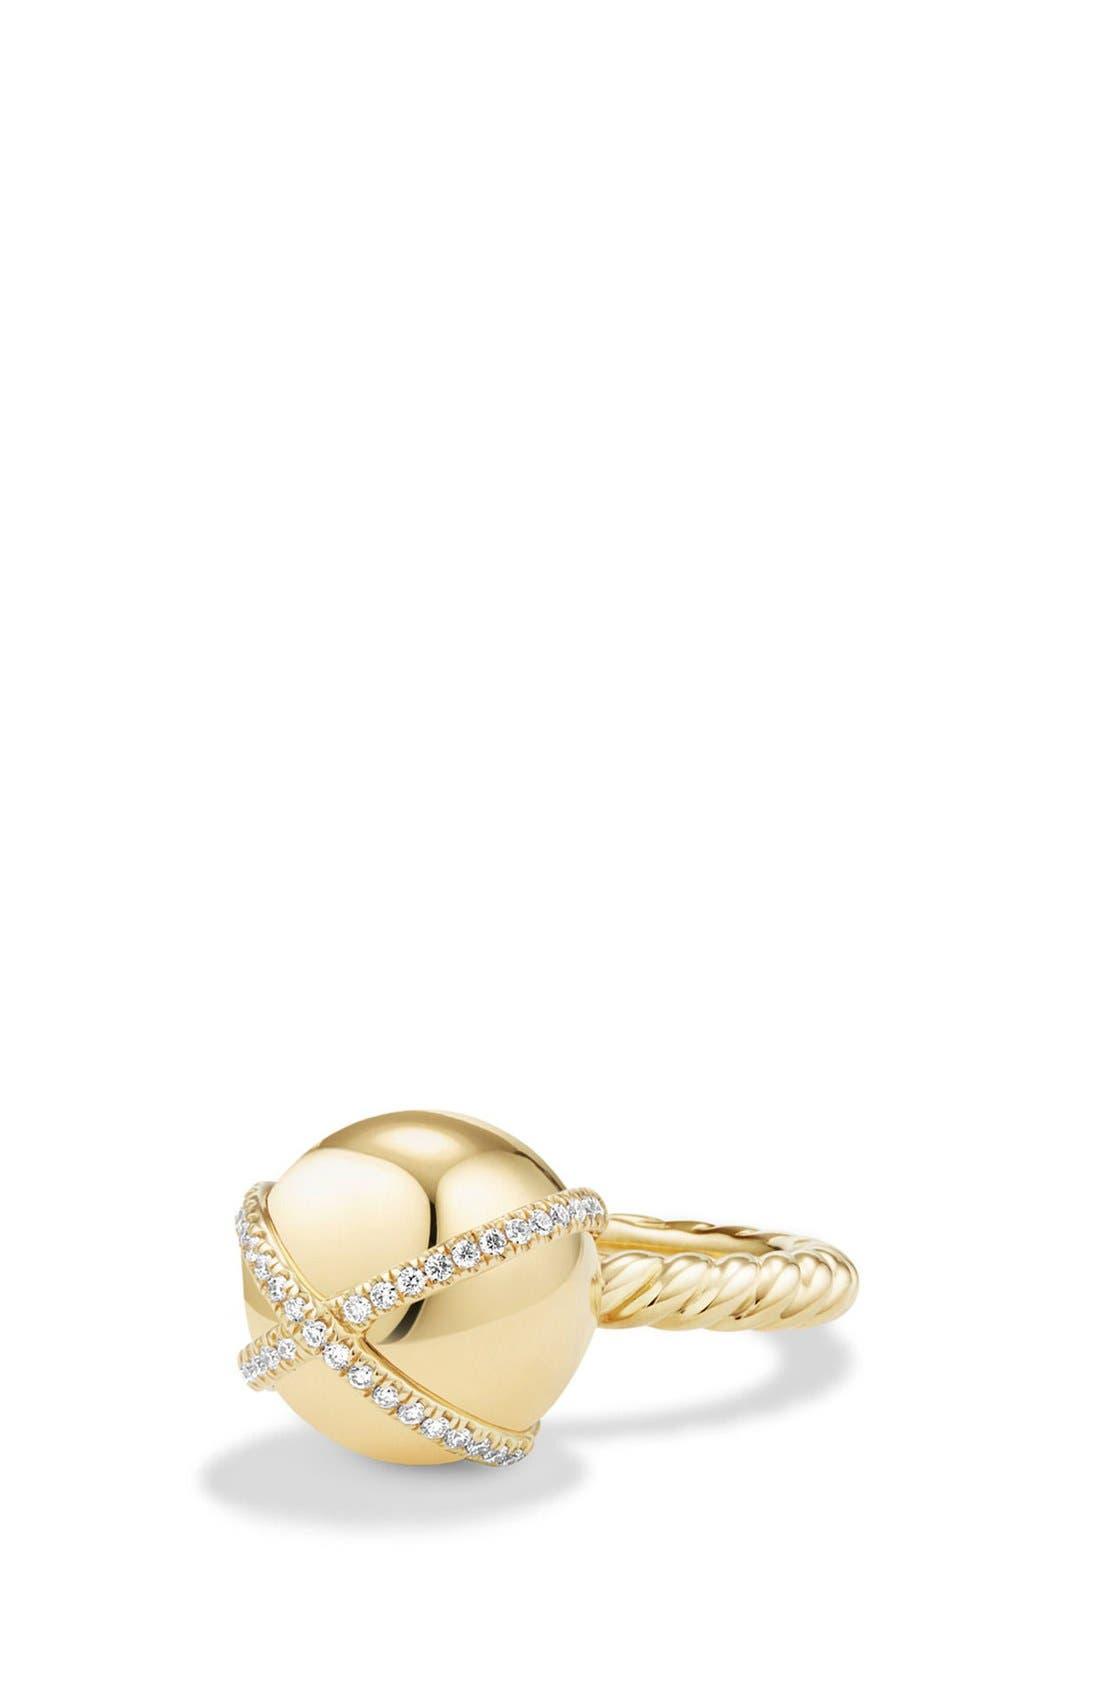 DAVID YURMAN Solari Wrap Ring with Pavé Diamonds in 18k Gold